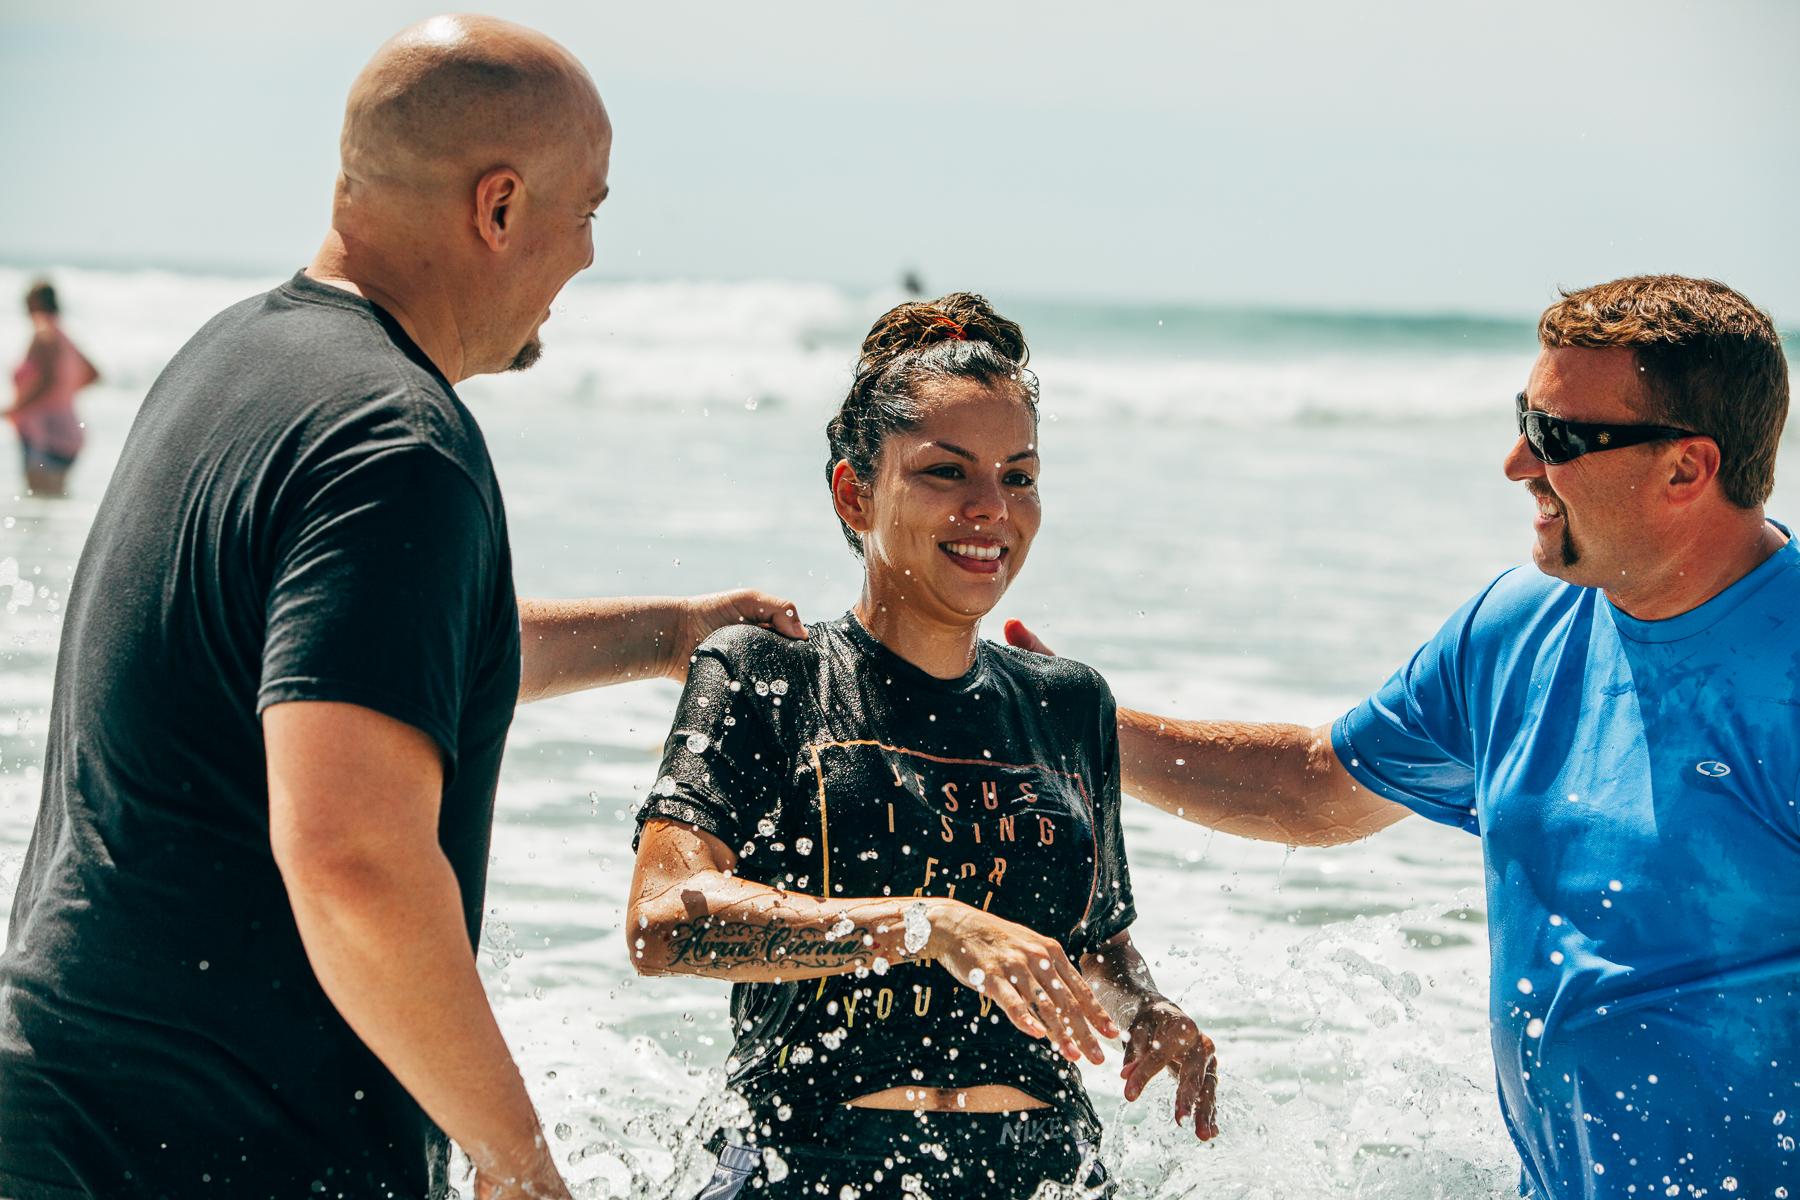 Beach_Baptism_2015_87.jpg